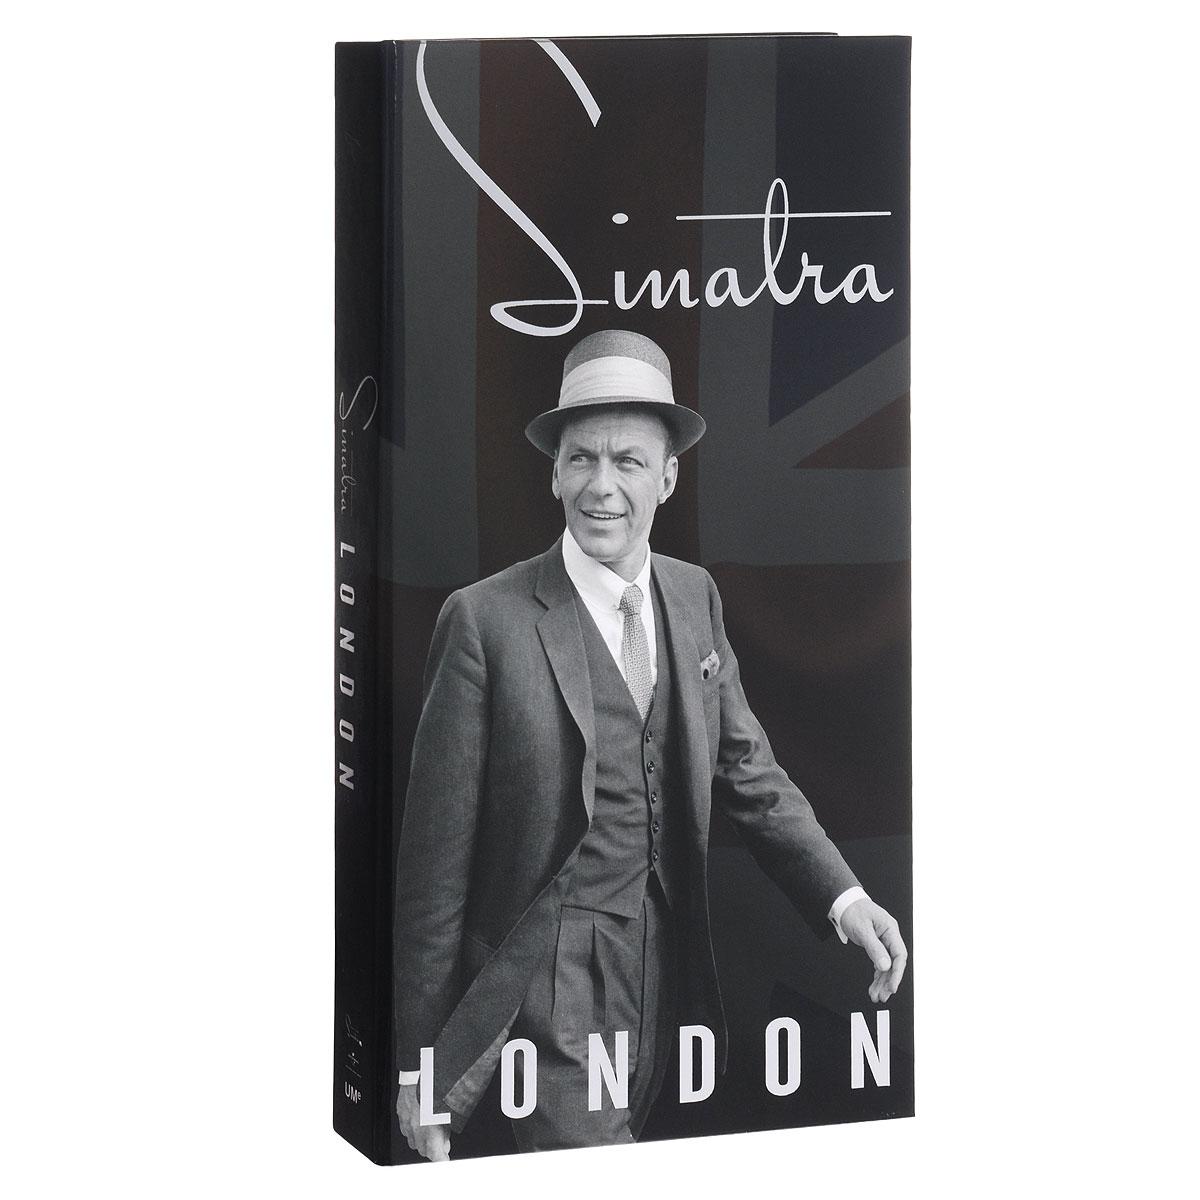 Sinatra. London (3 CD + DVD) 2014